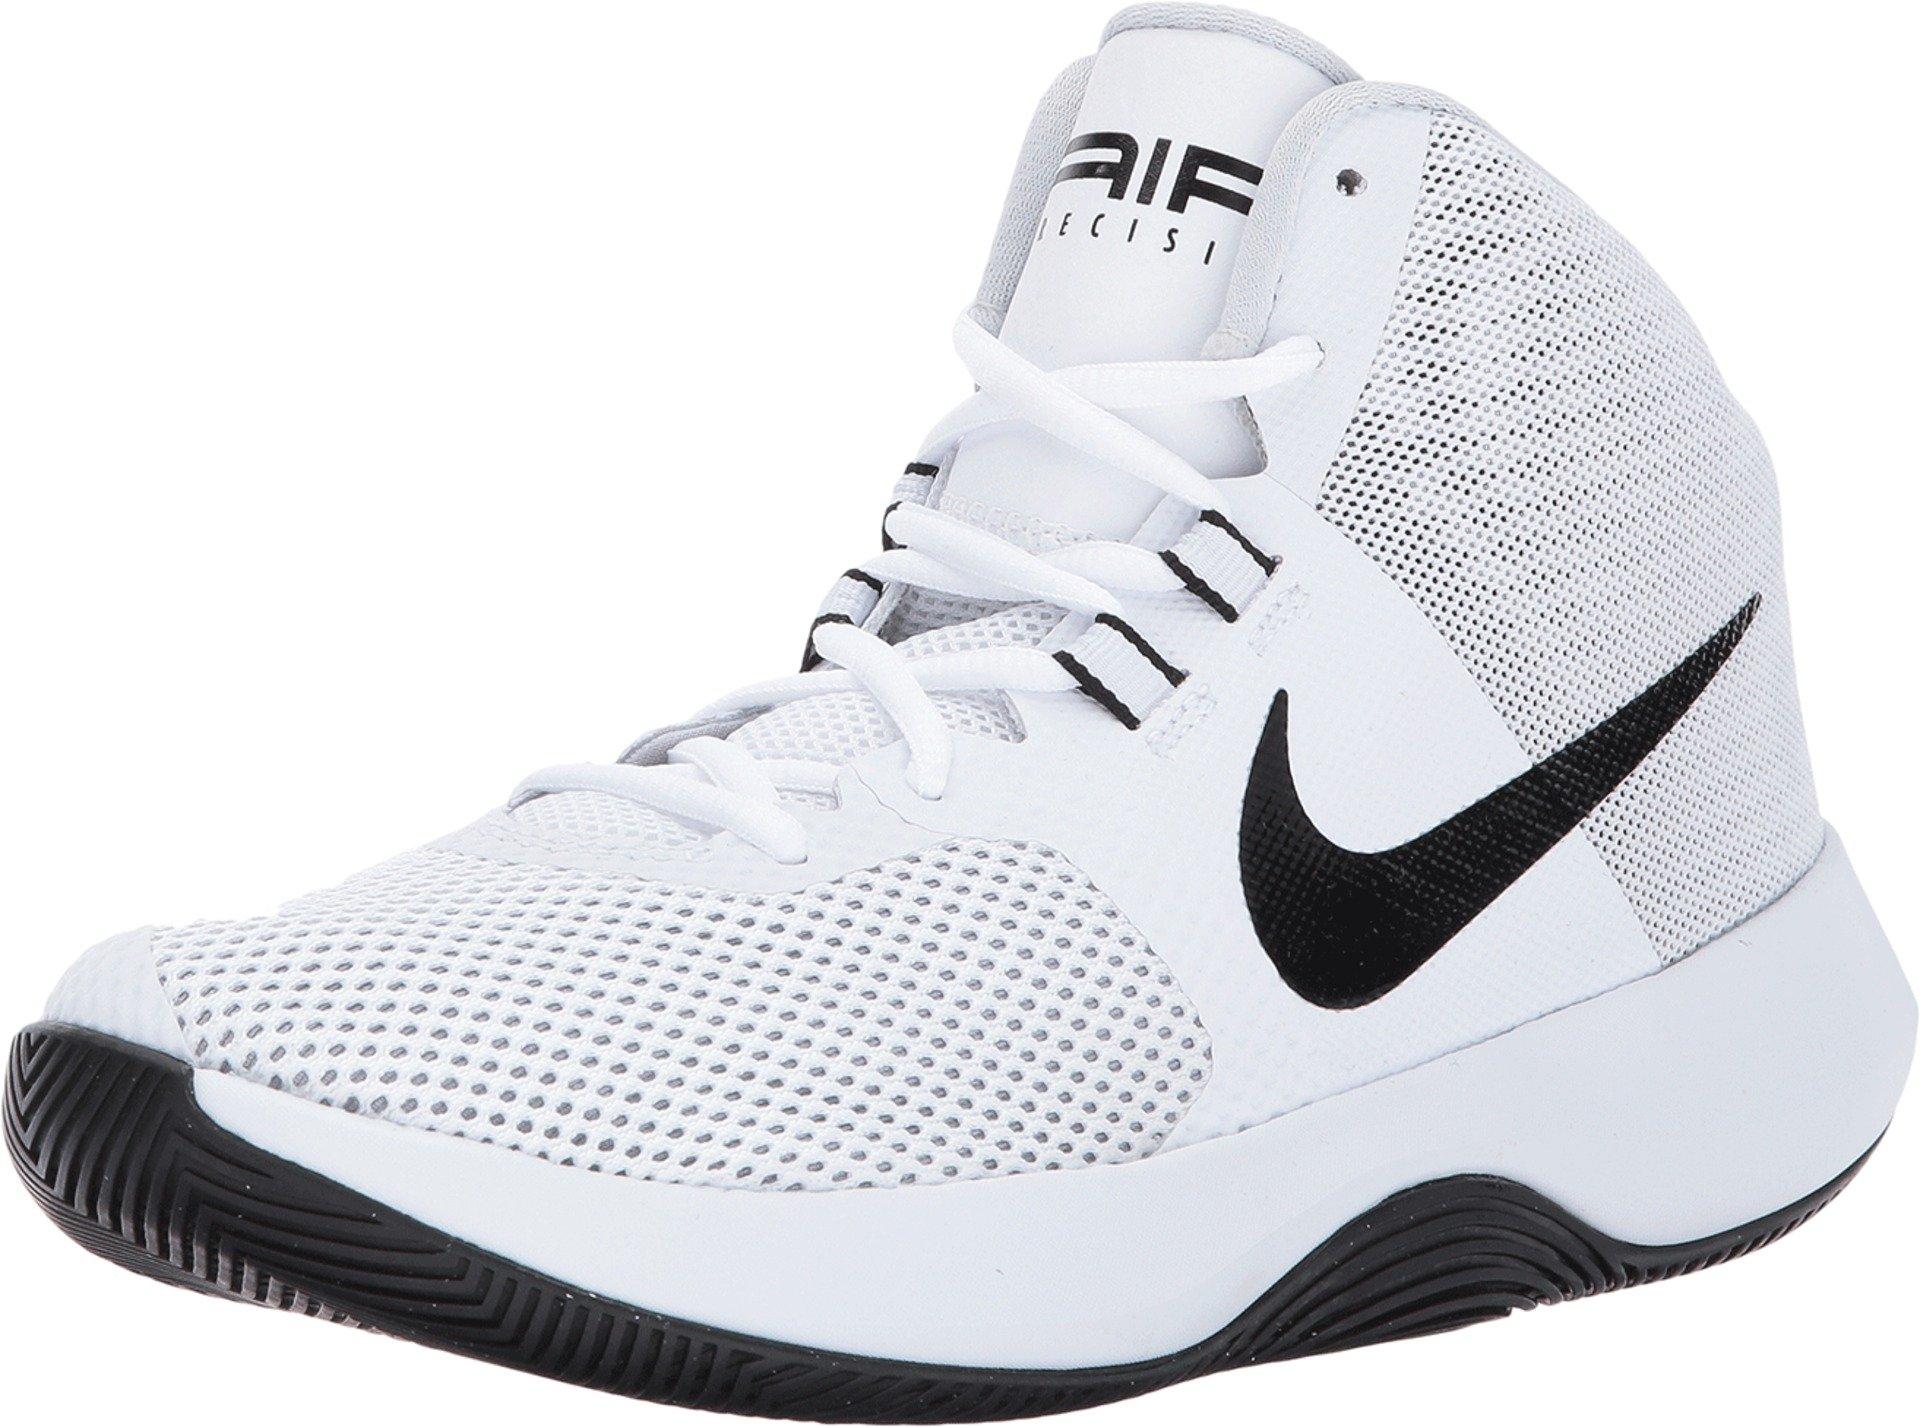 NIKE Women's Air Precision Basketball Shoes (10, White)